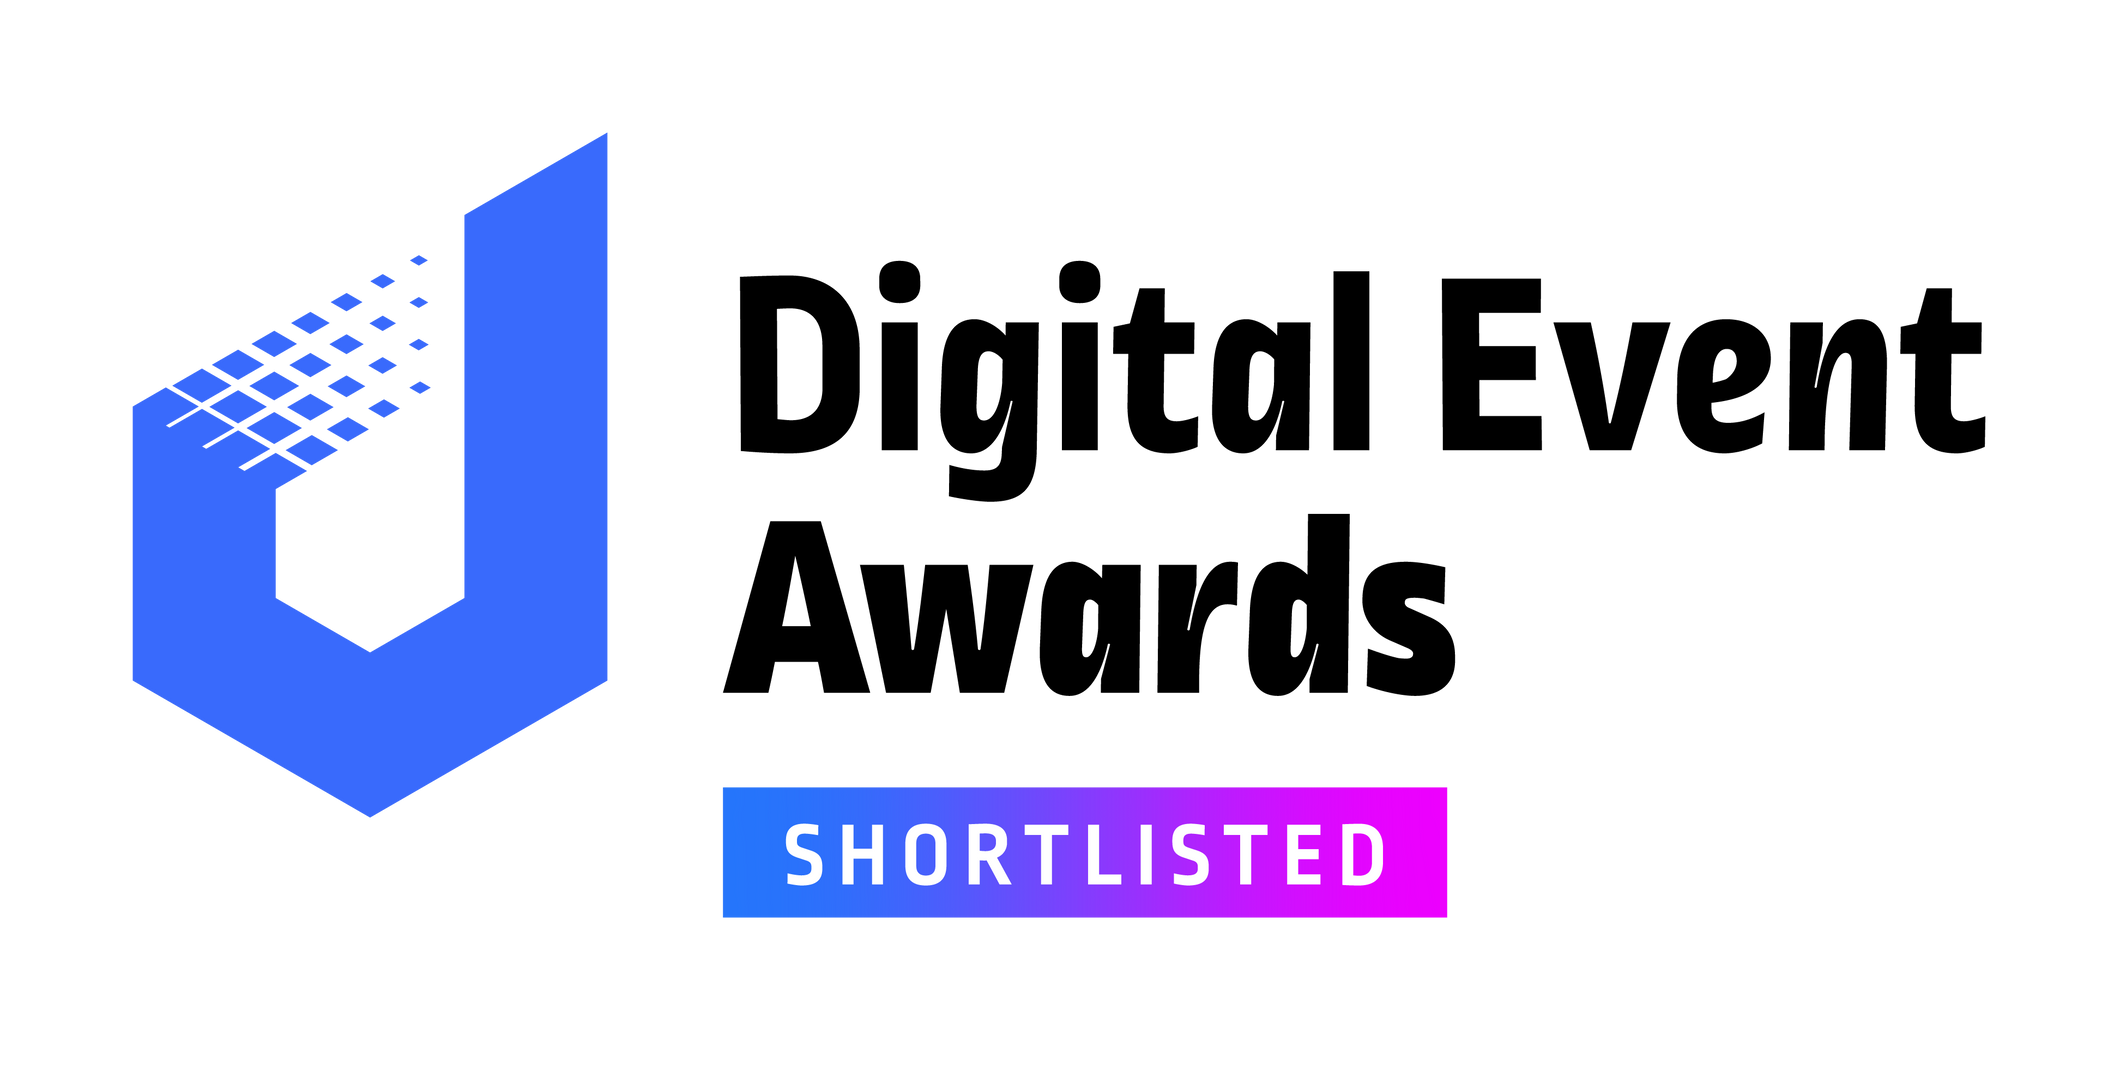 DEA_Shortlisted_DEA_Shortlisted_FullColo